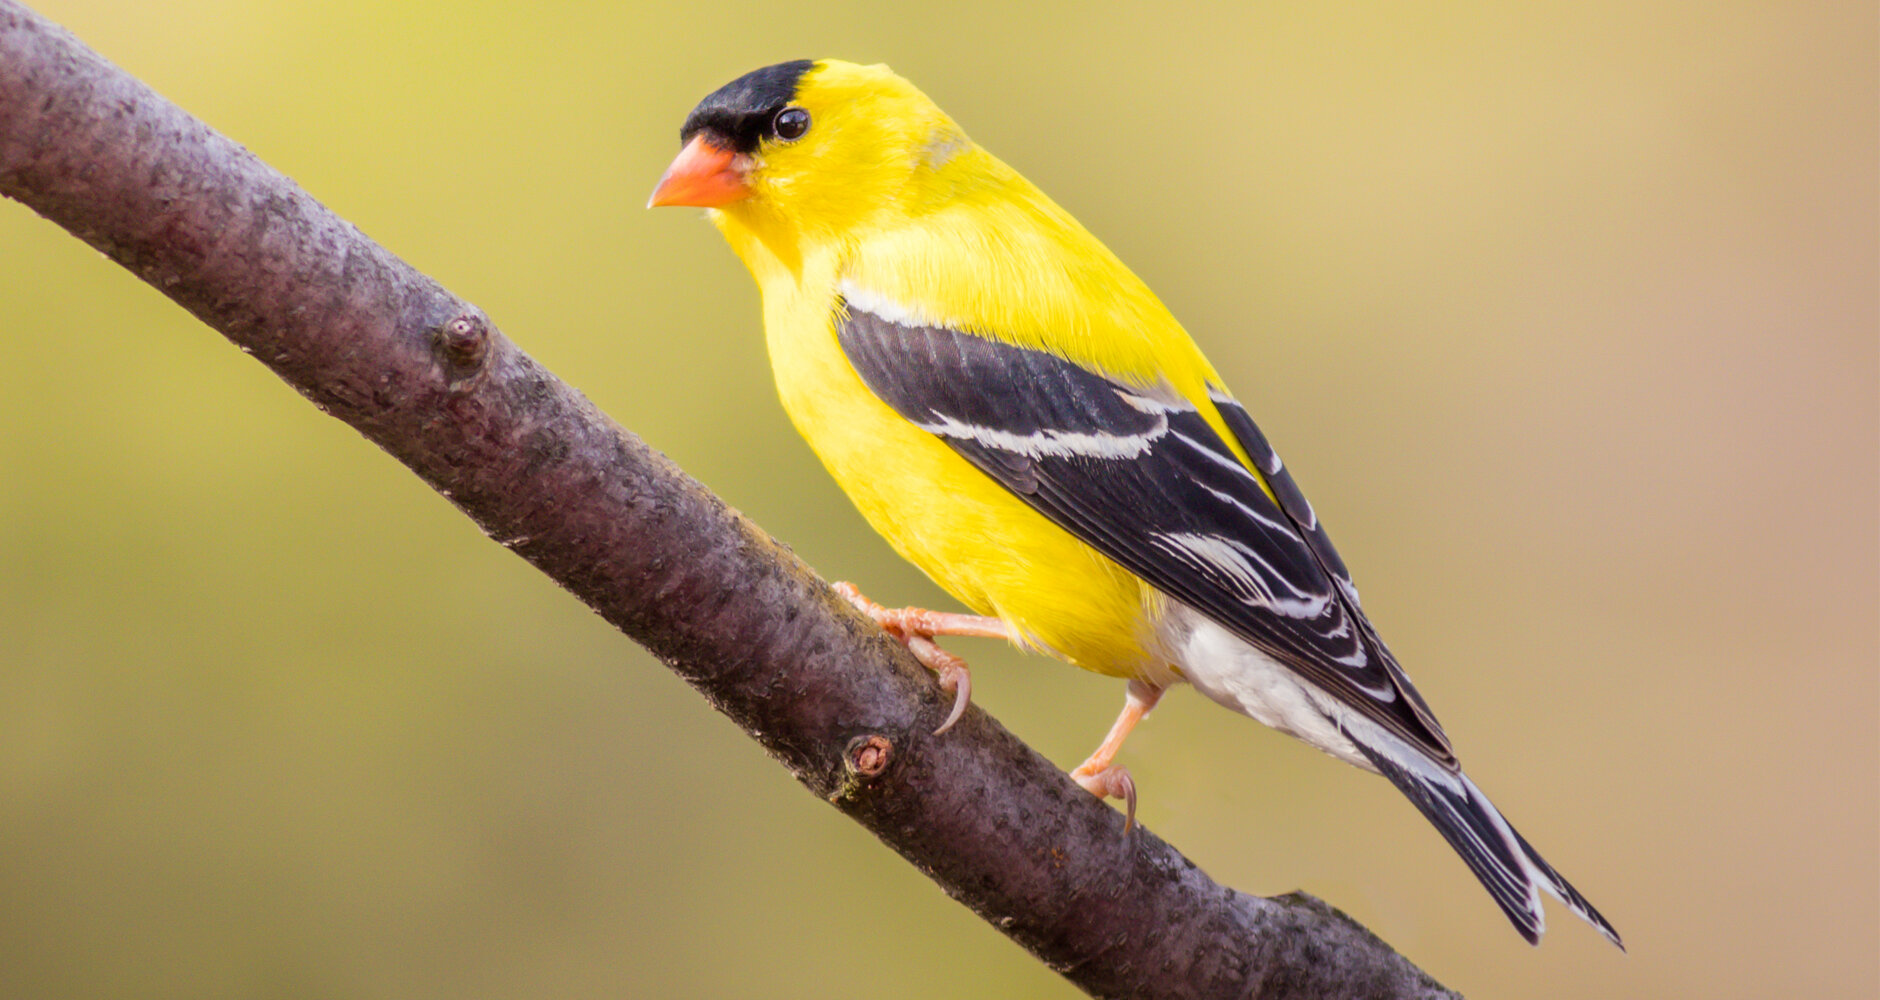 Songbirds-American-Goldfinch-A146348148.jpg